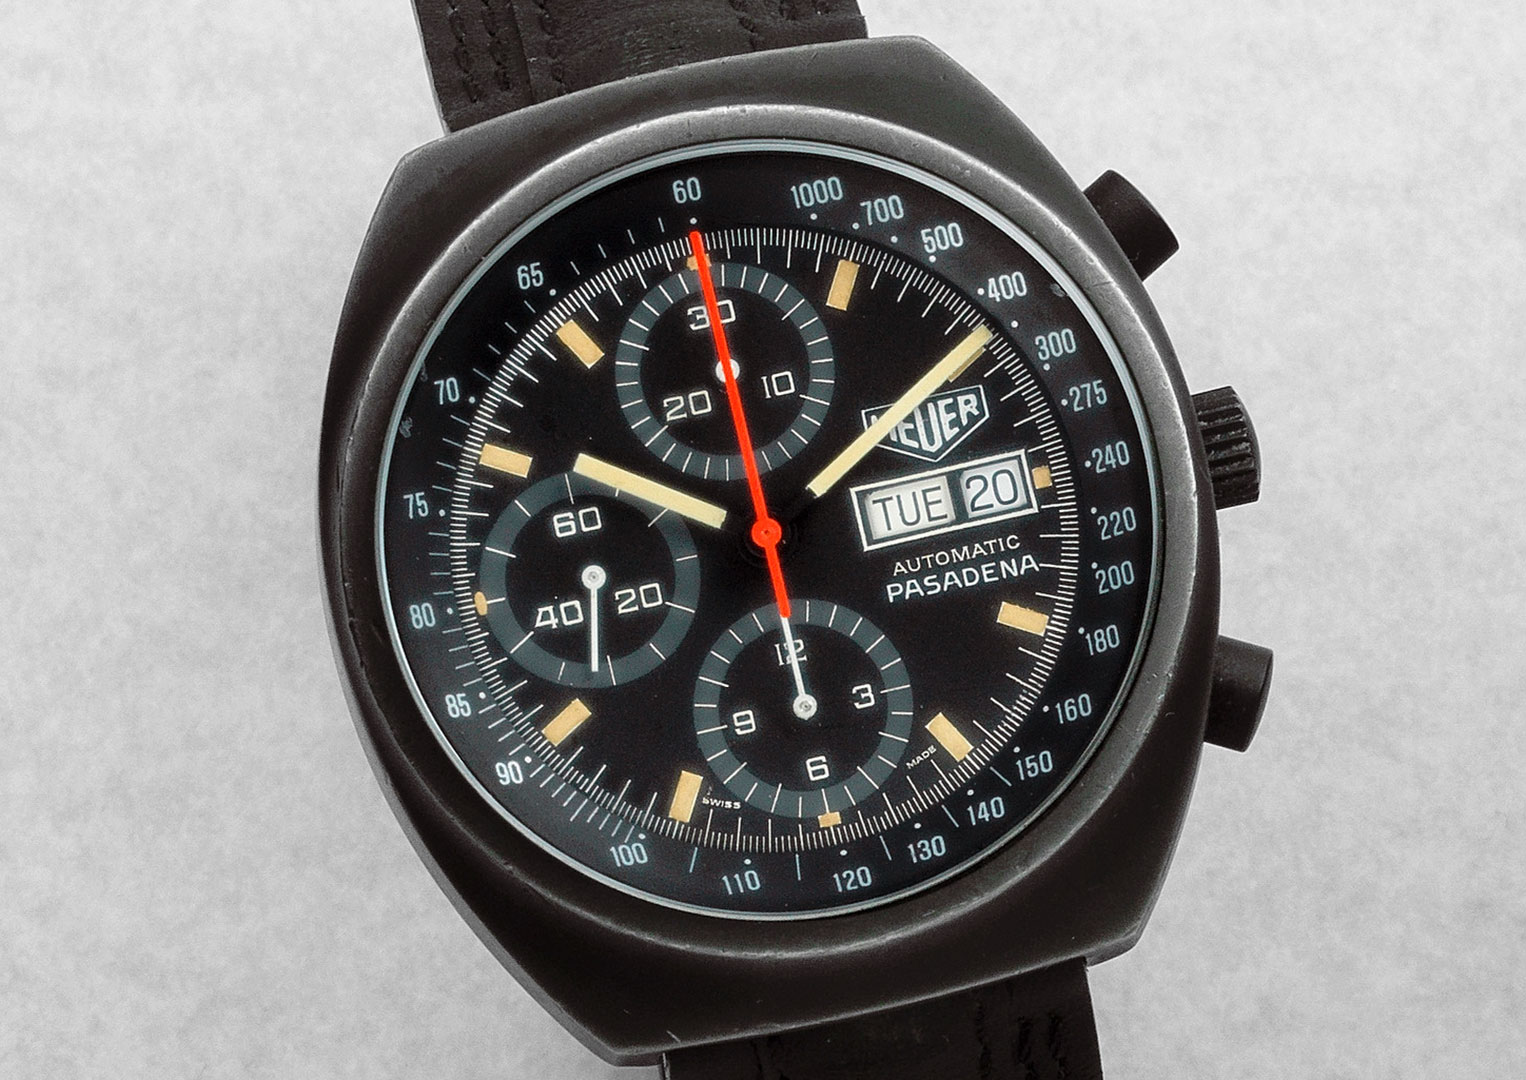 A Heuer Pasadena chronograph from 1981 powered by a Valjoux Calibre 7750. Image courtesy of Bonhams.